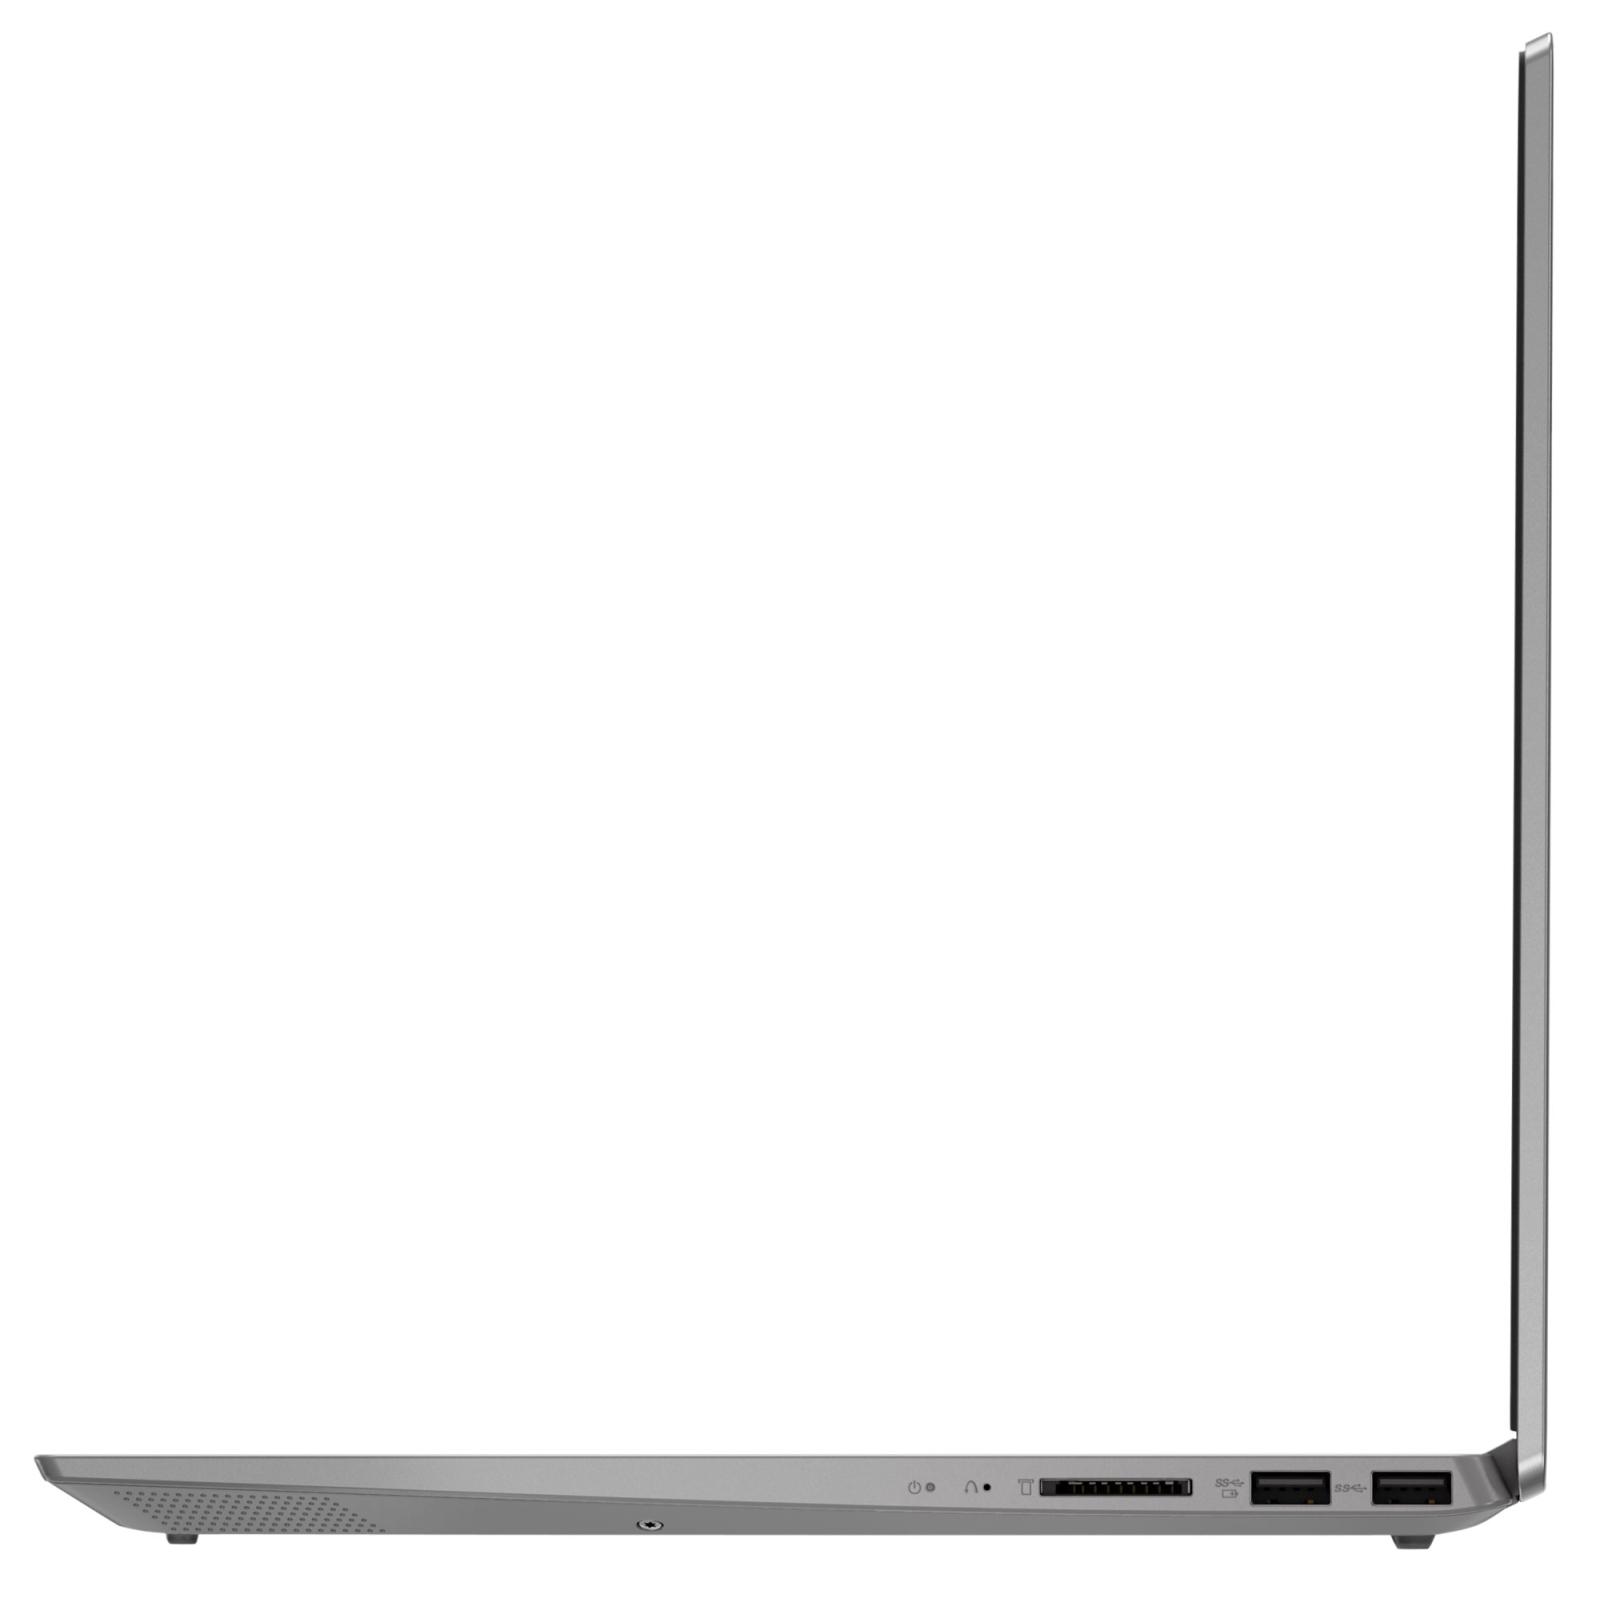 Ноутбук Lenovo IdeaPad S340-15 (81N800Y5RA) изображение 6